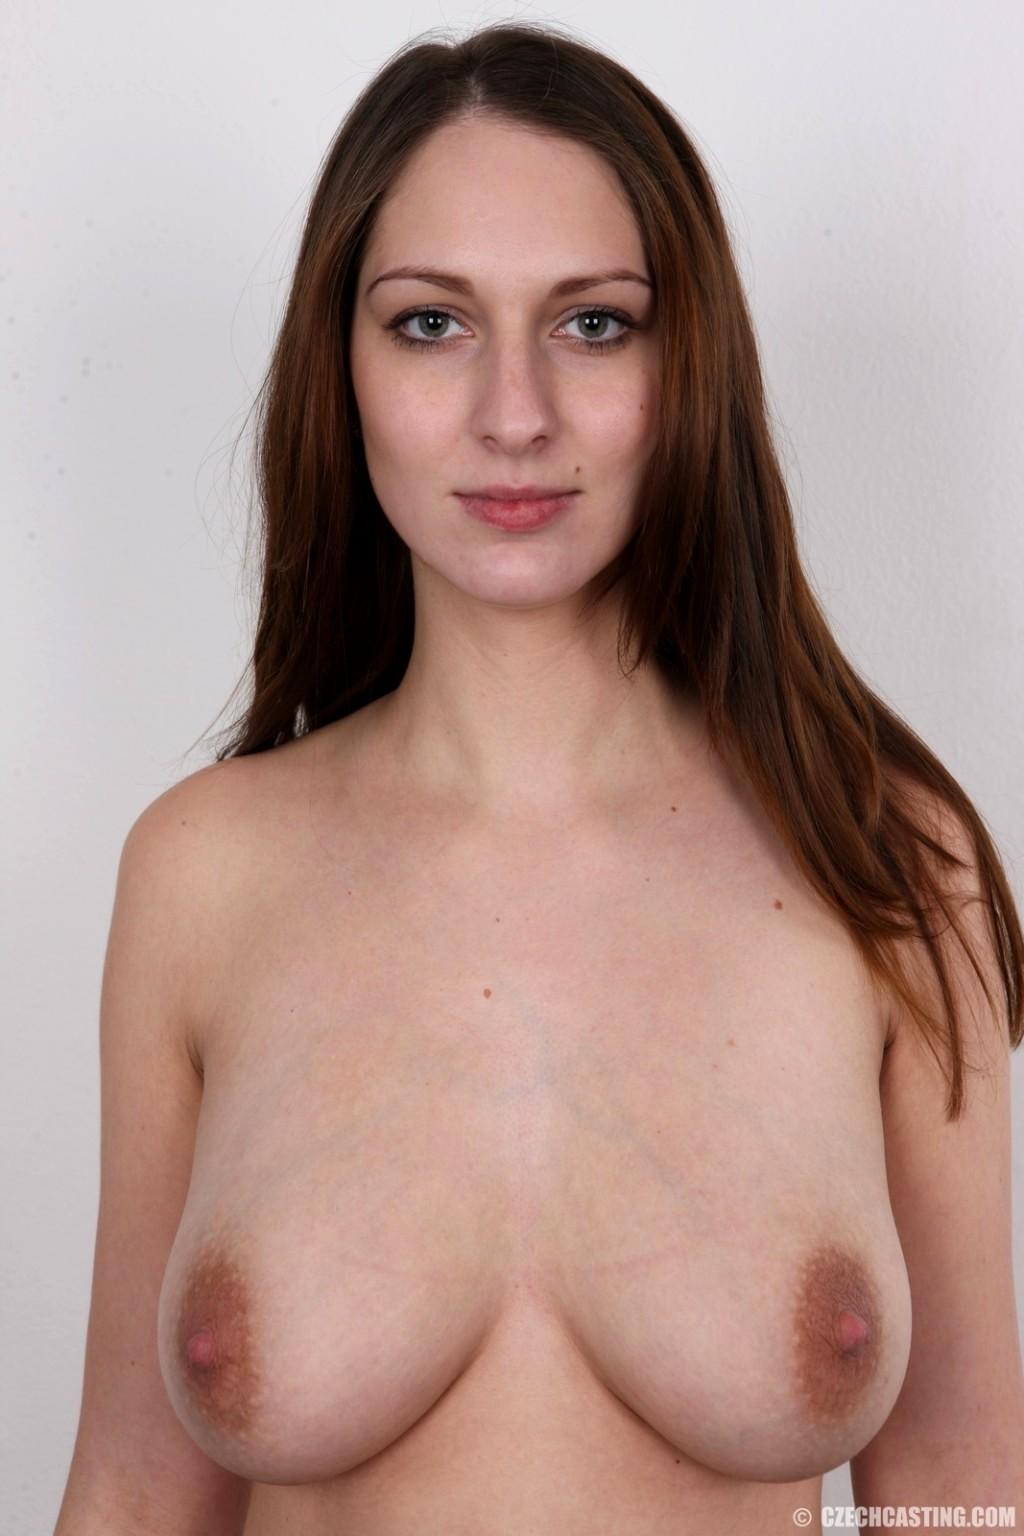 Czech Casting Czechcasting Model Vip Student Torrent Sex -6849